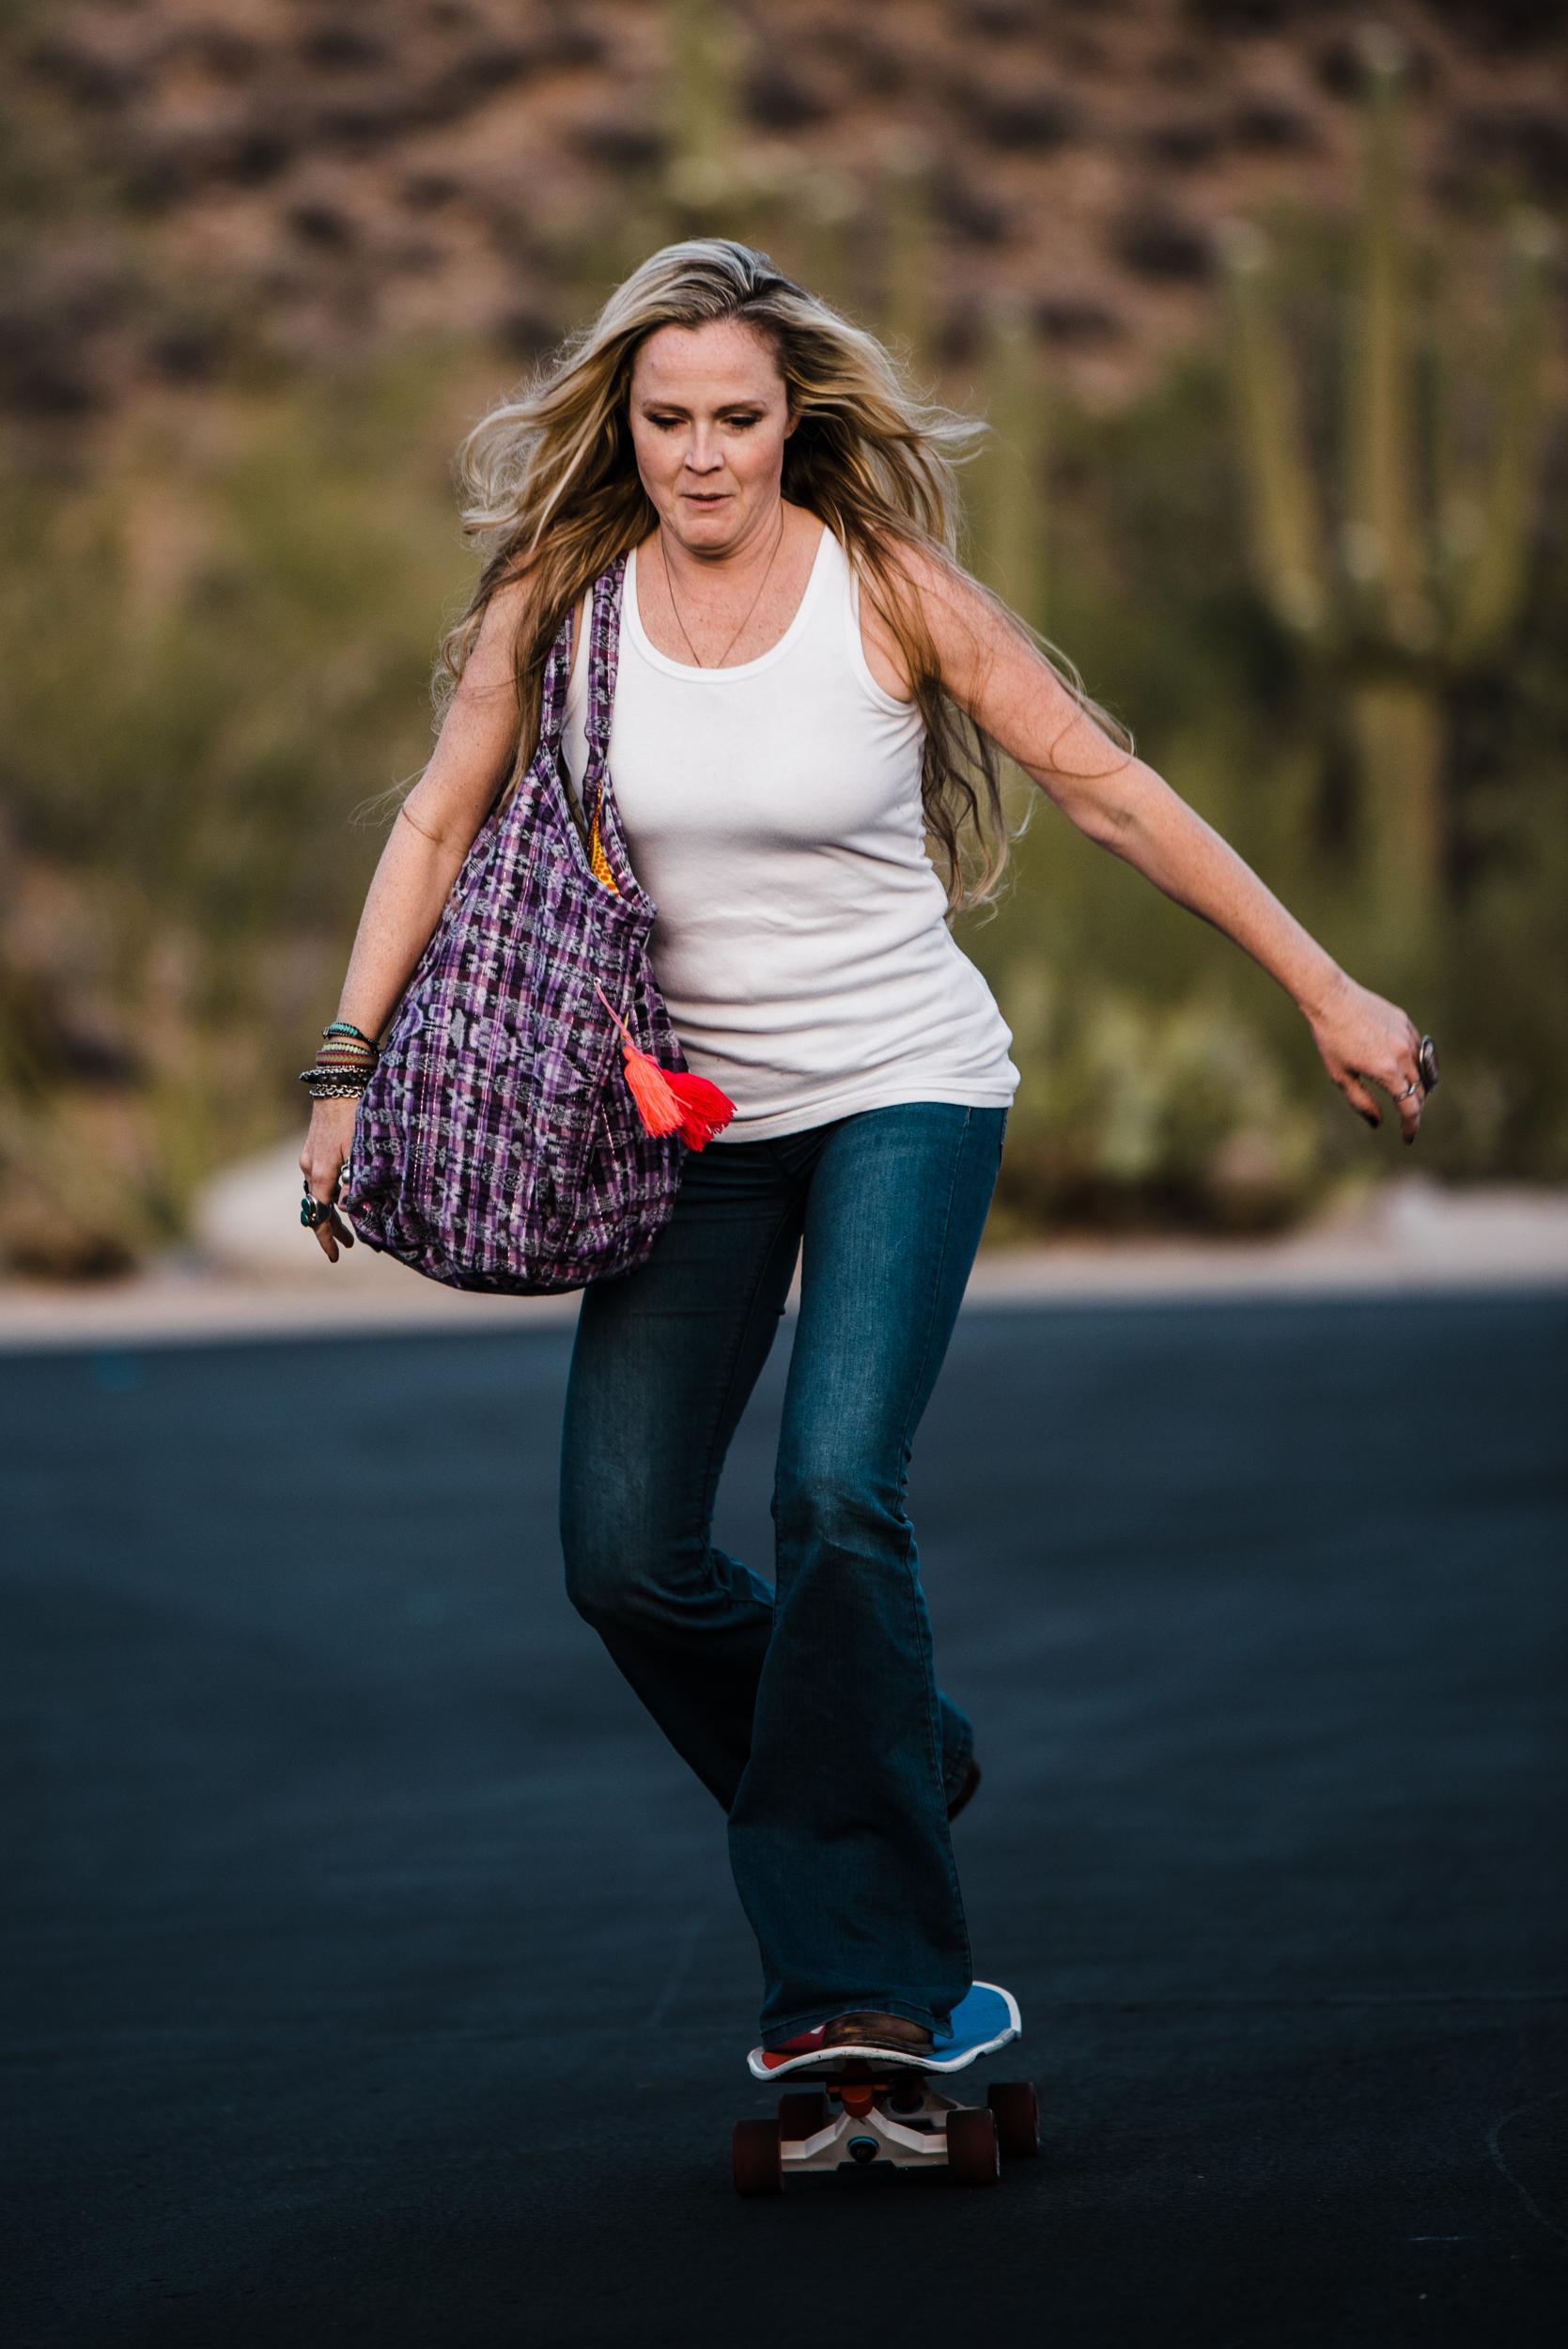 Arizona-love-hippie-momma-bags-boho-10.jpg